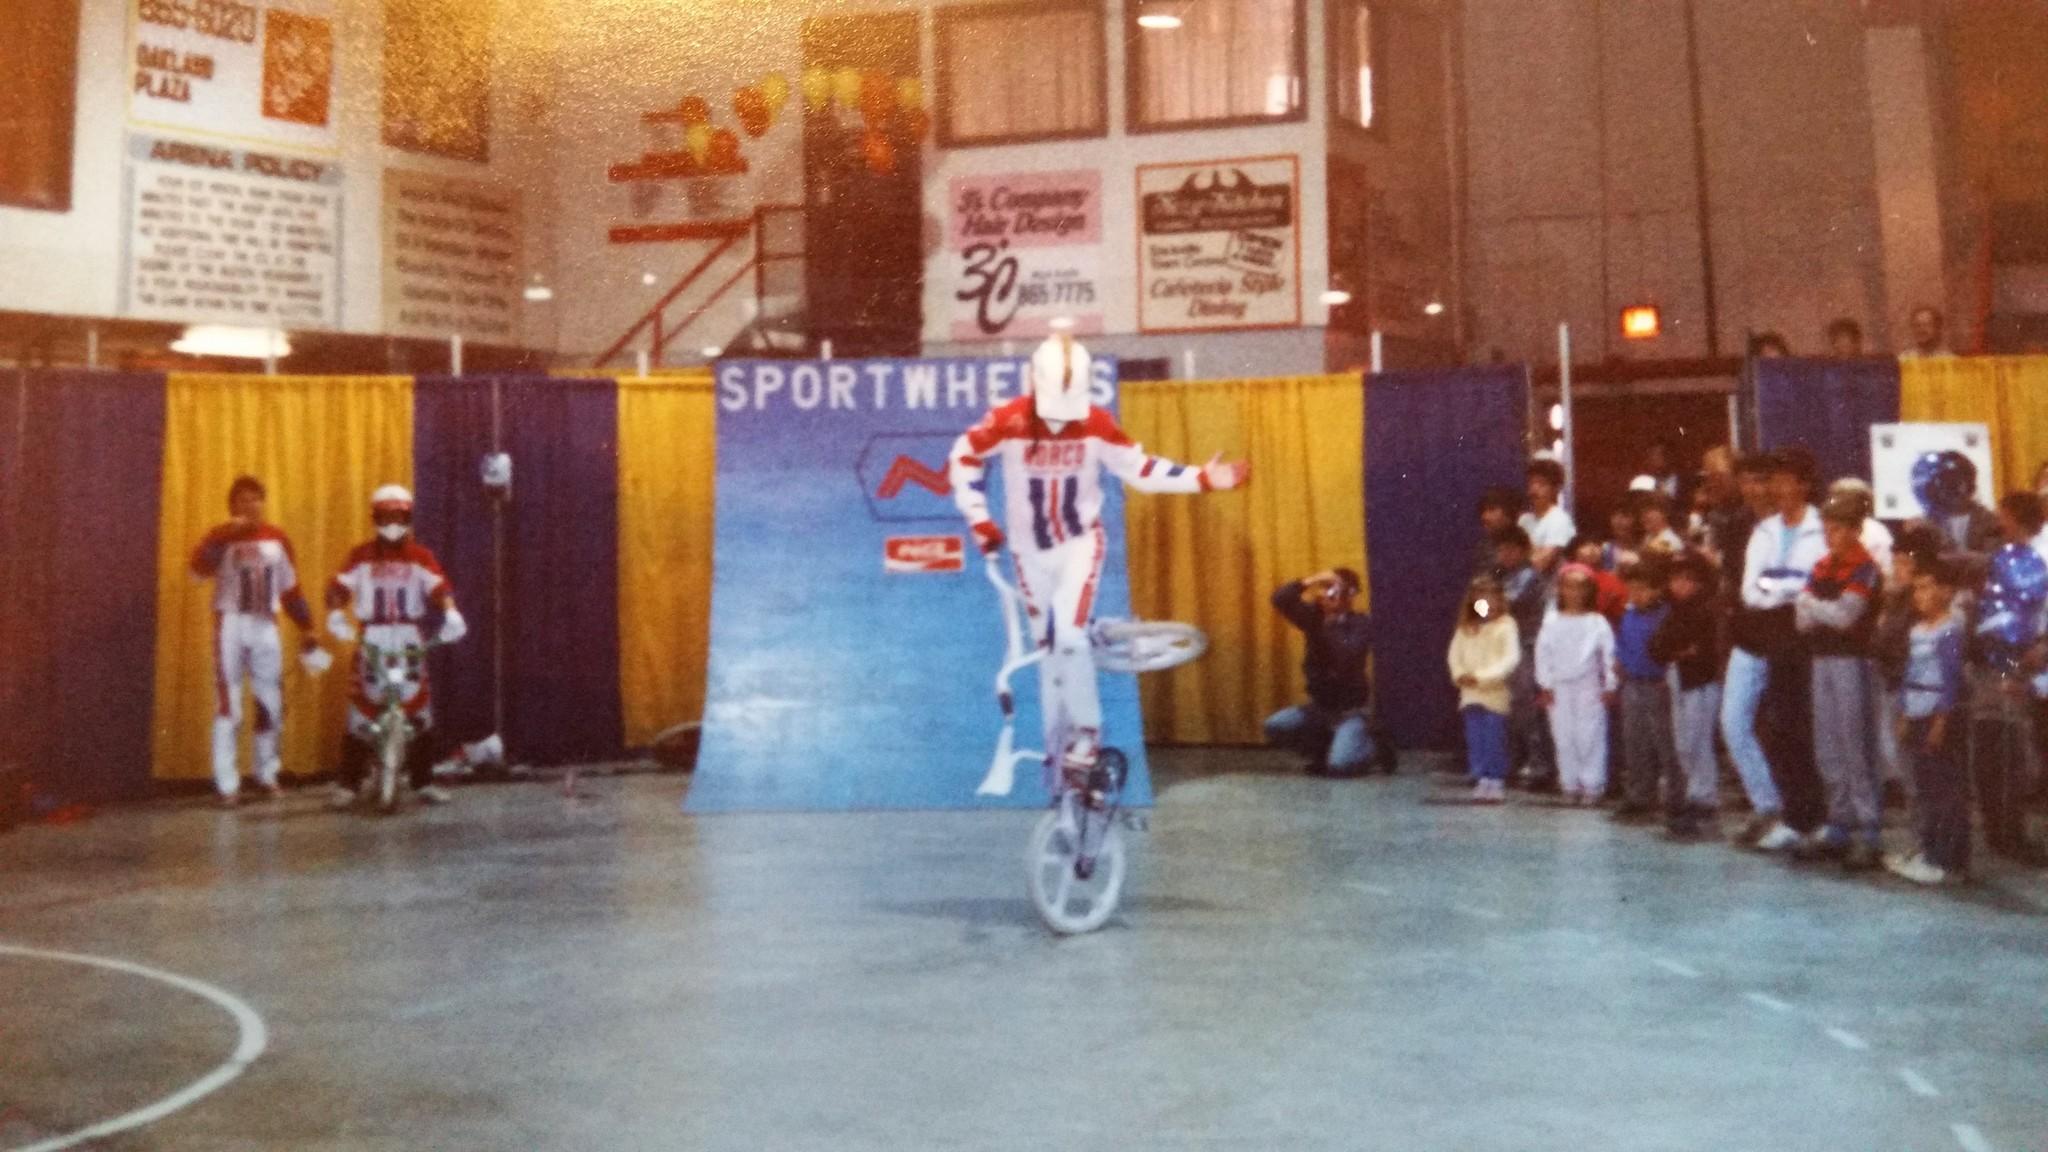 Sportwheels BMX Team